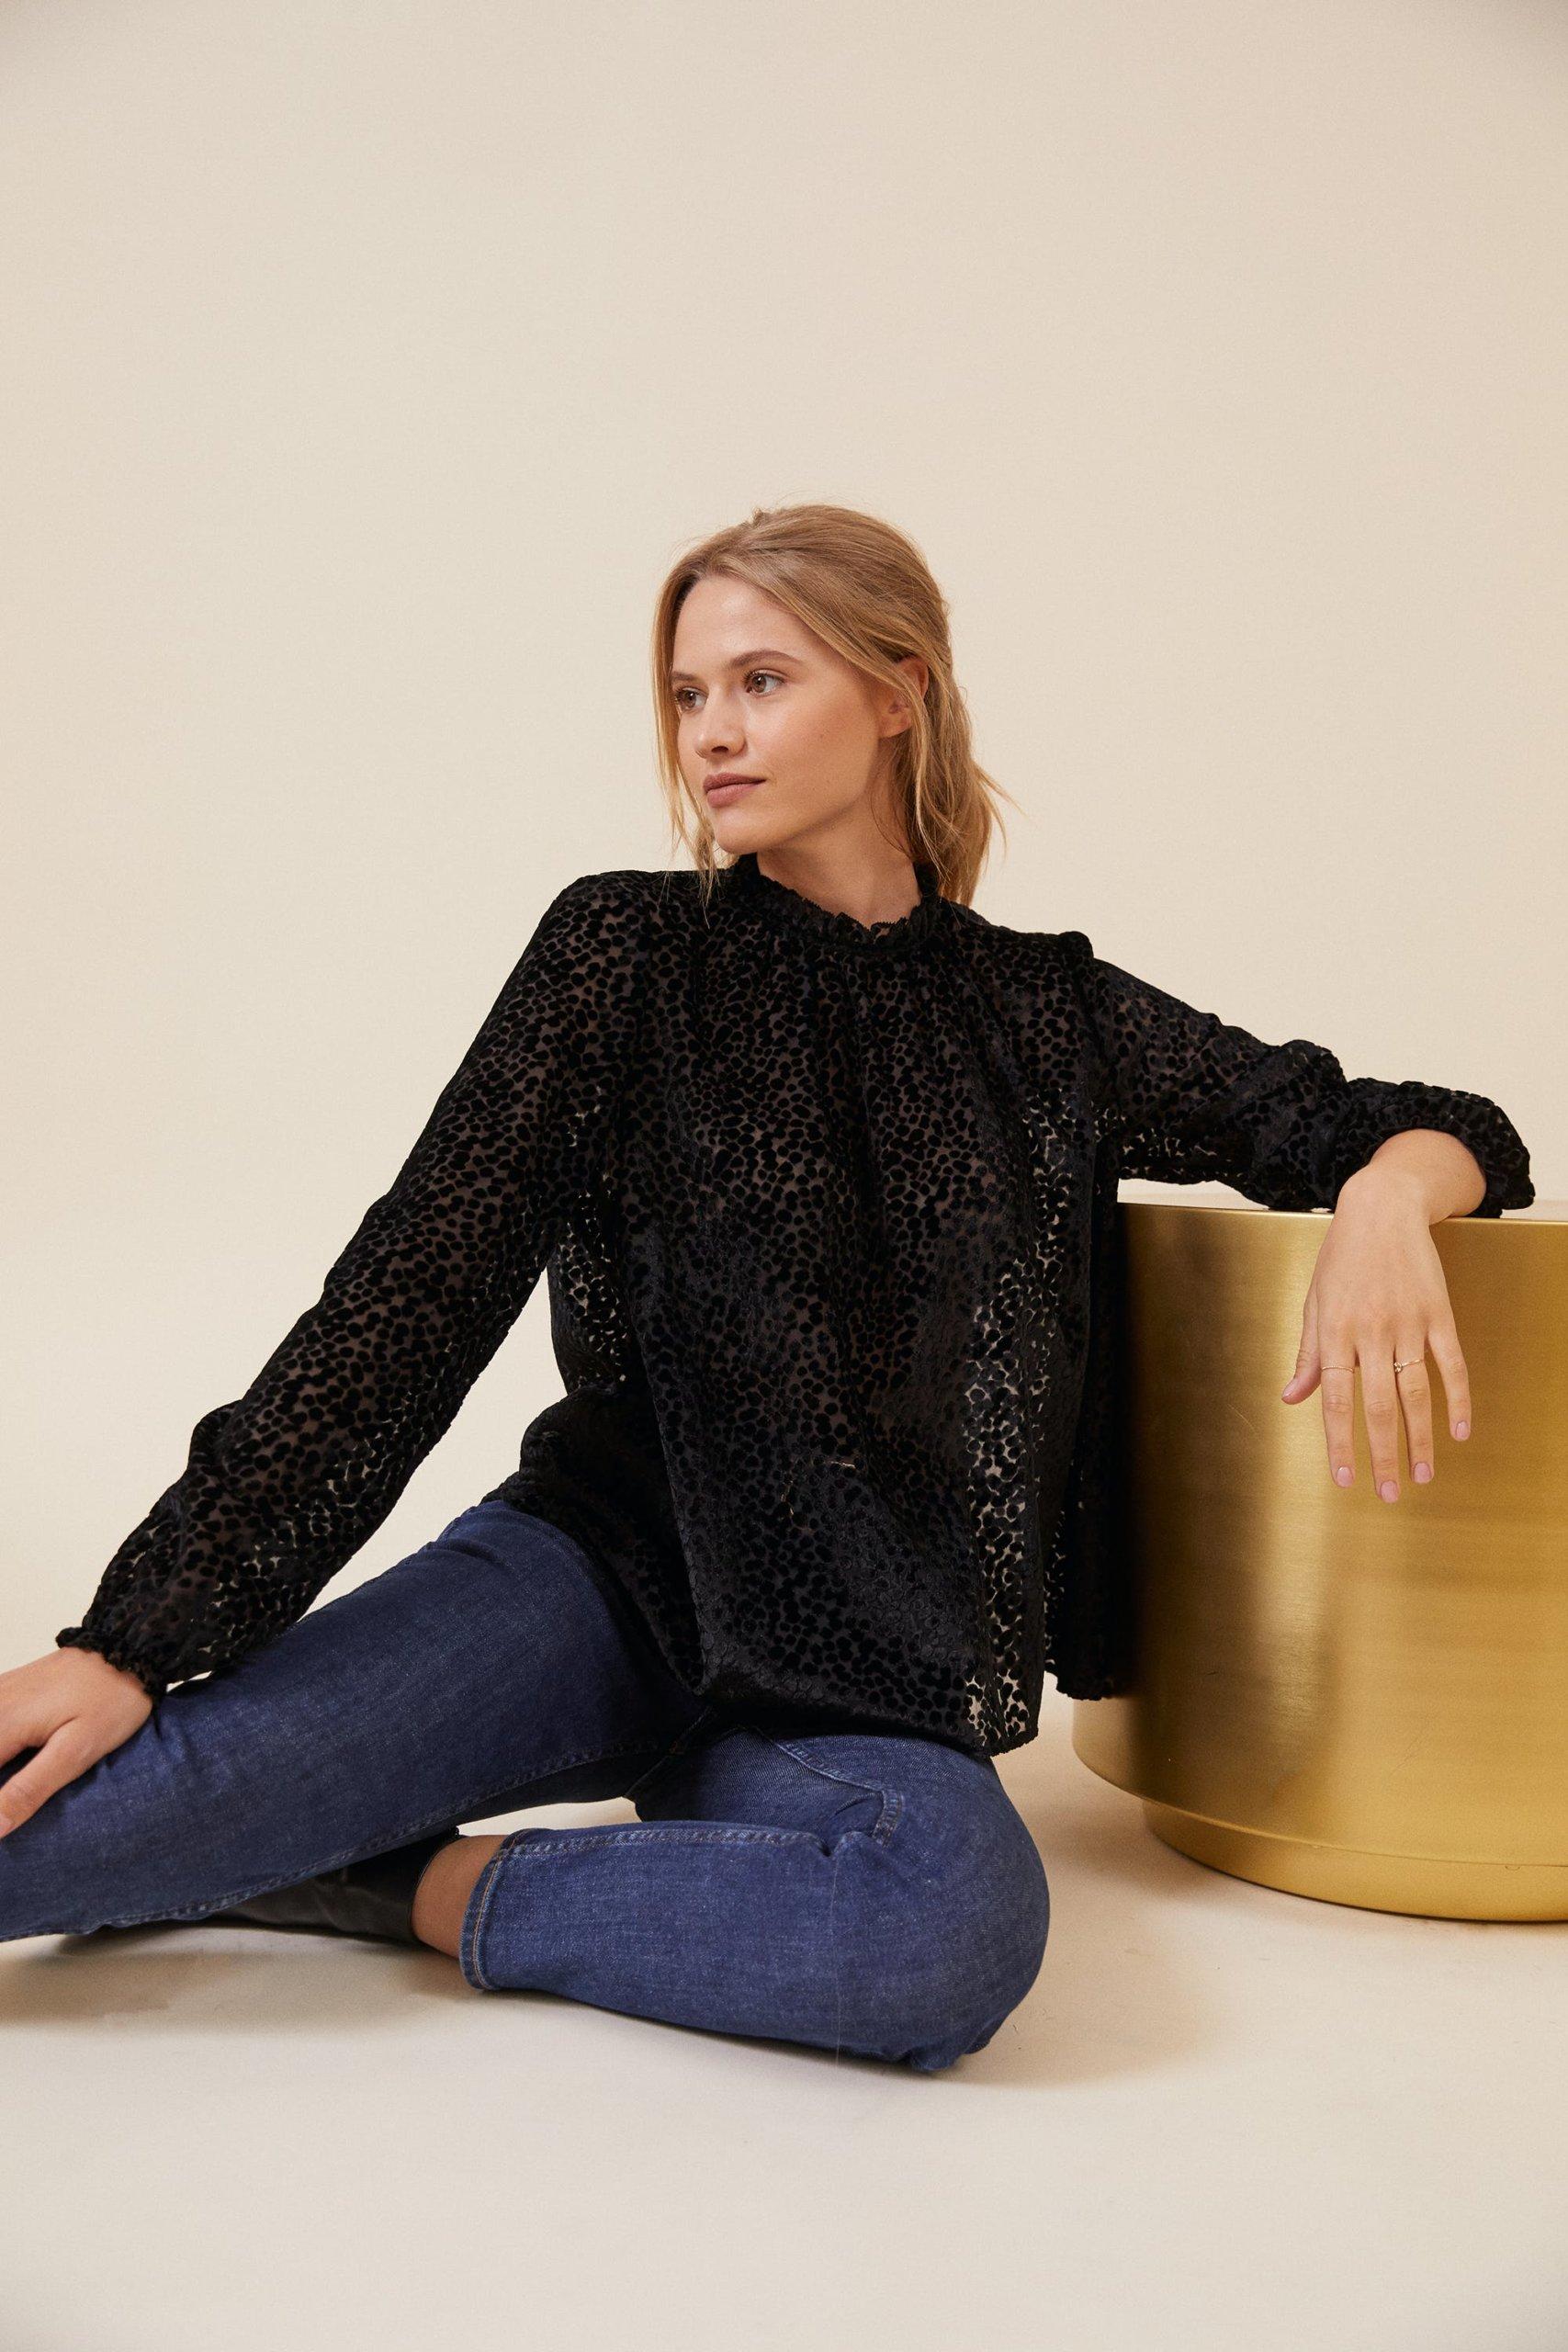 Idano Winter 2020 Modekollektion